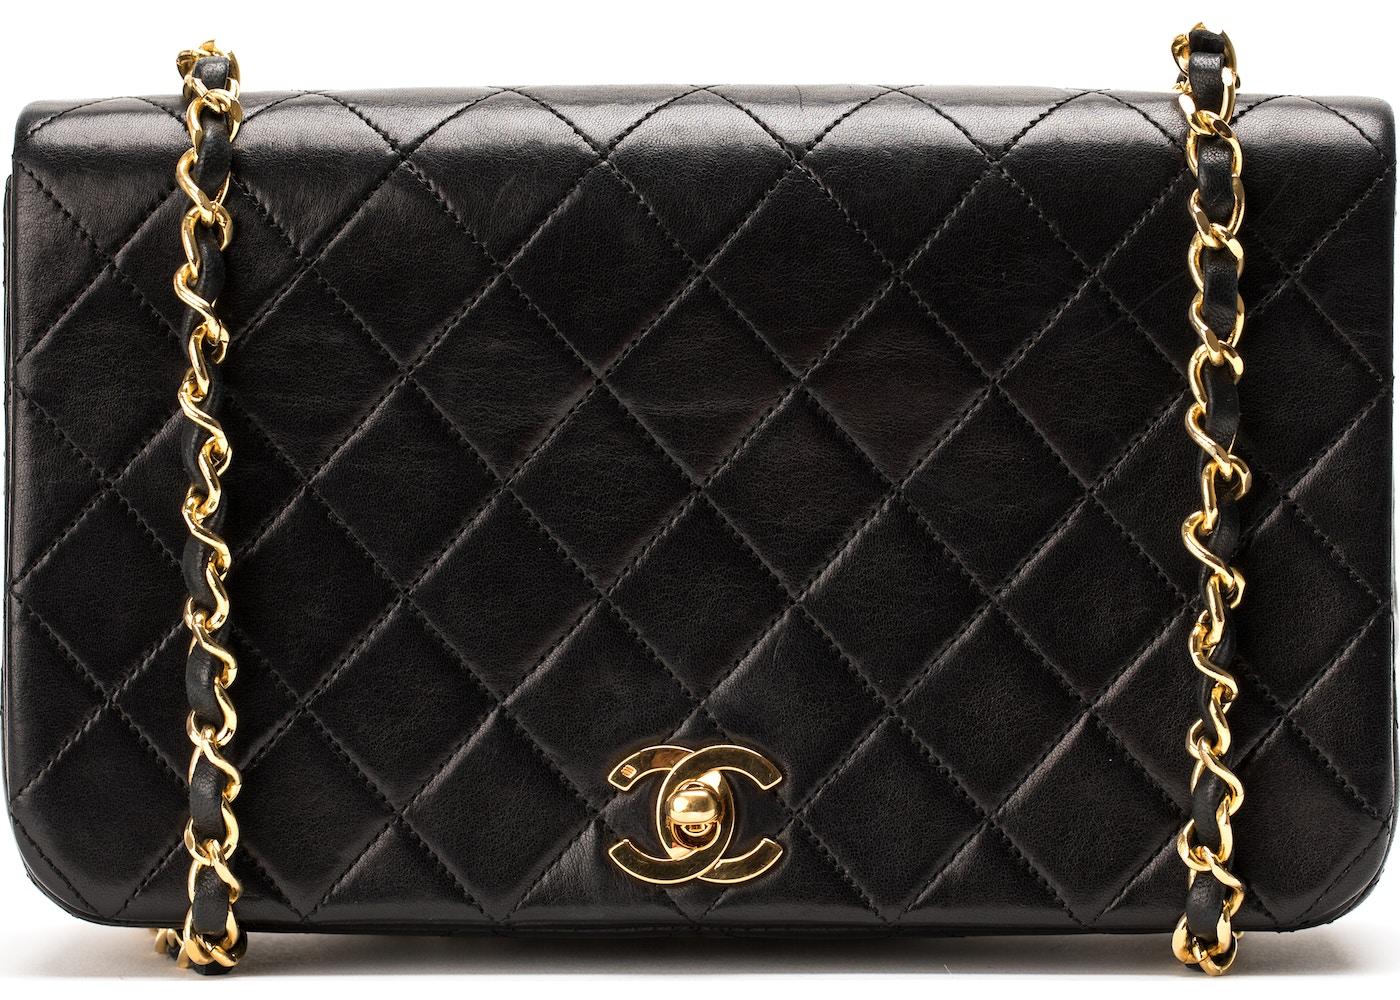 c675a8f7c5b2 Chanel Vintage Full Flap Stitched Small Black. Stitched Small Black